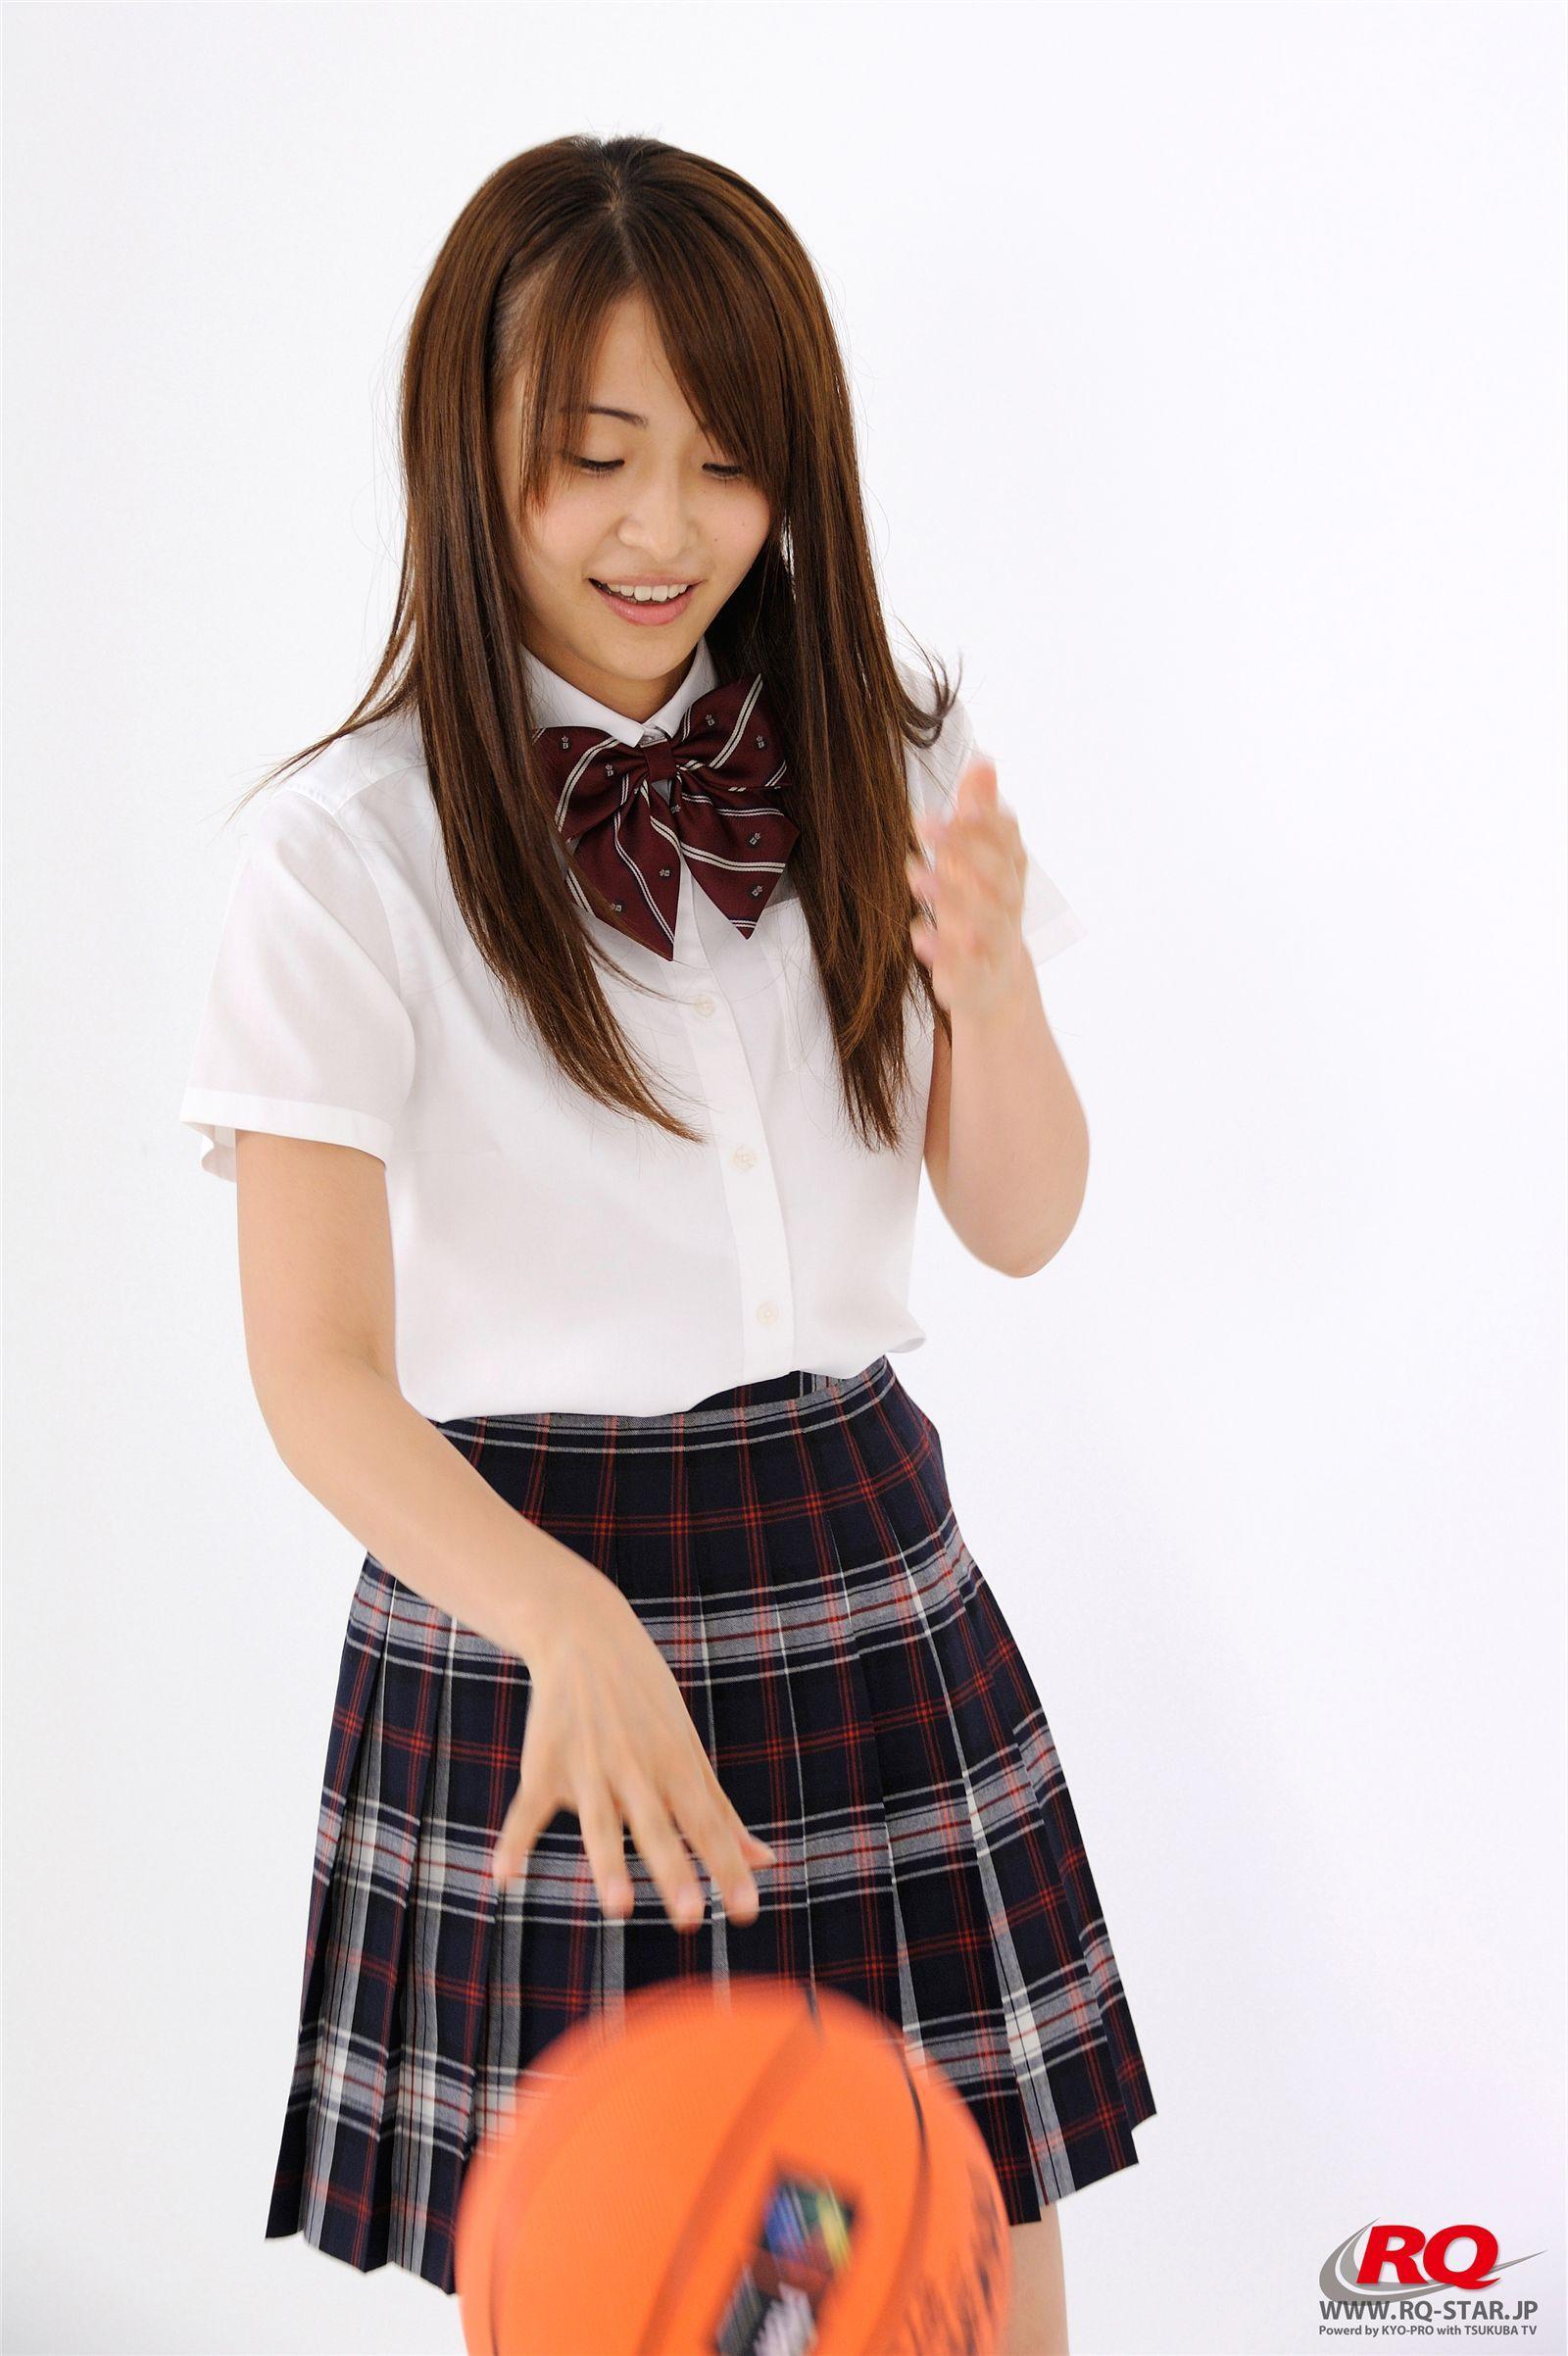 [RQ STAR美女] NO.01148 Rena Sawai 澤井玲菜 Student Style[40P] RQ STAR 第4张